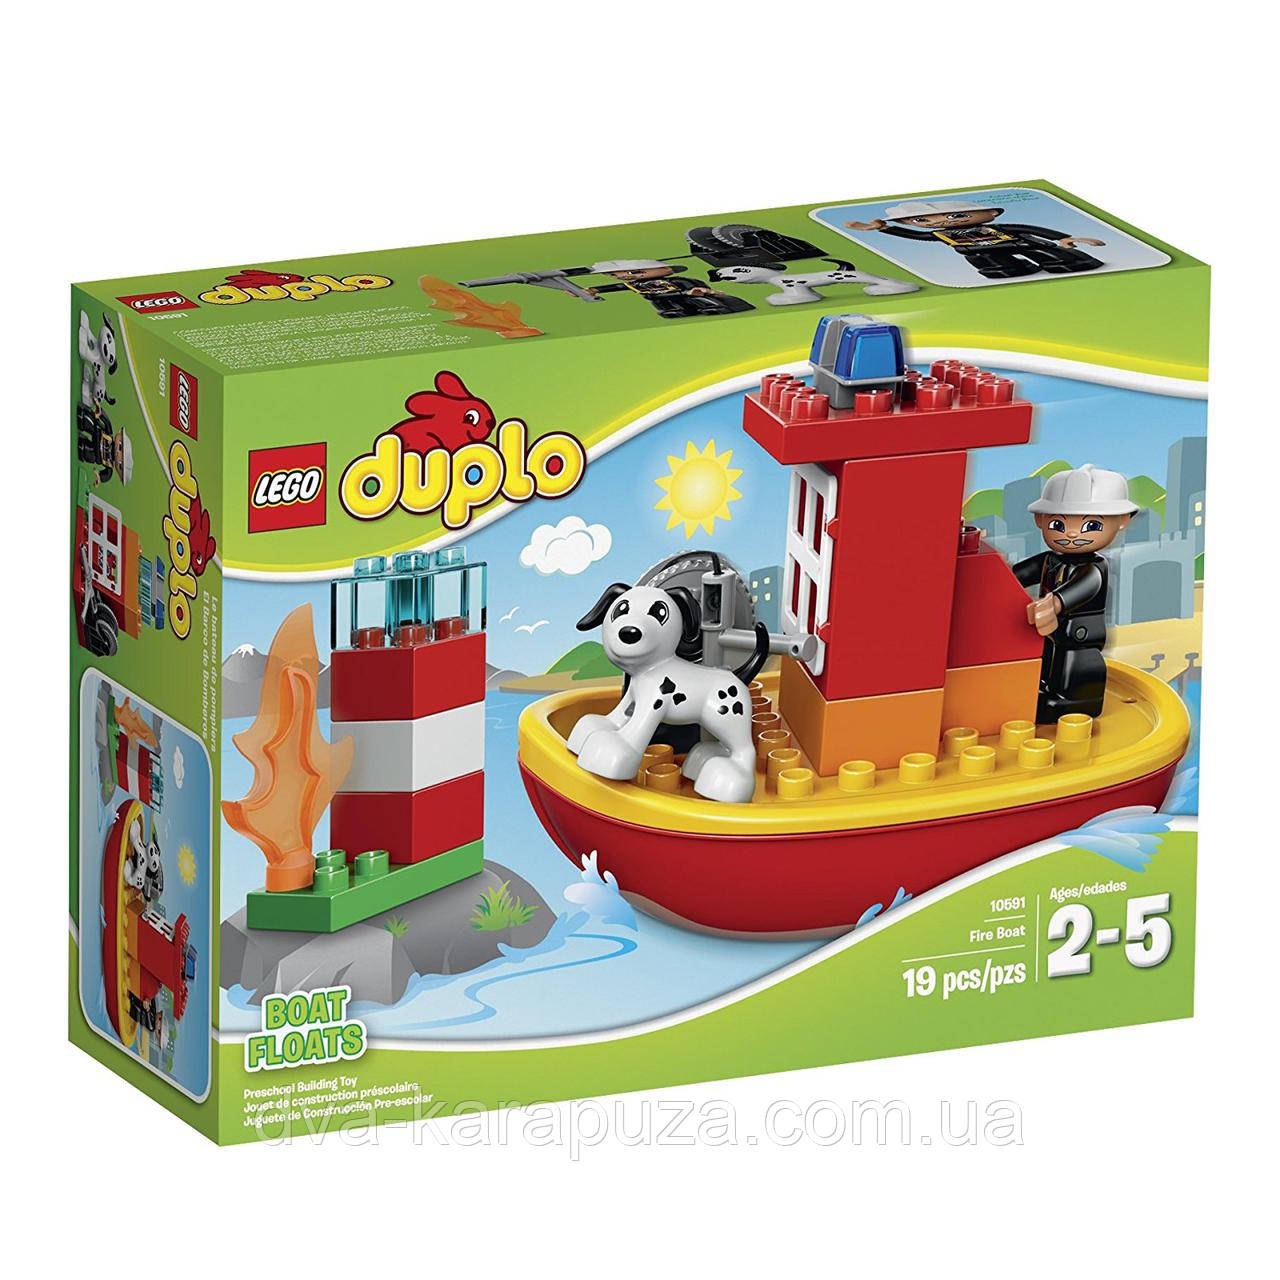 832c0d432ab Конструктор Lego Duplo Town 10591 Fire Boat Building Kit! Оригинал!, фото 1